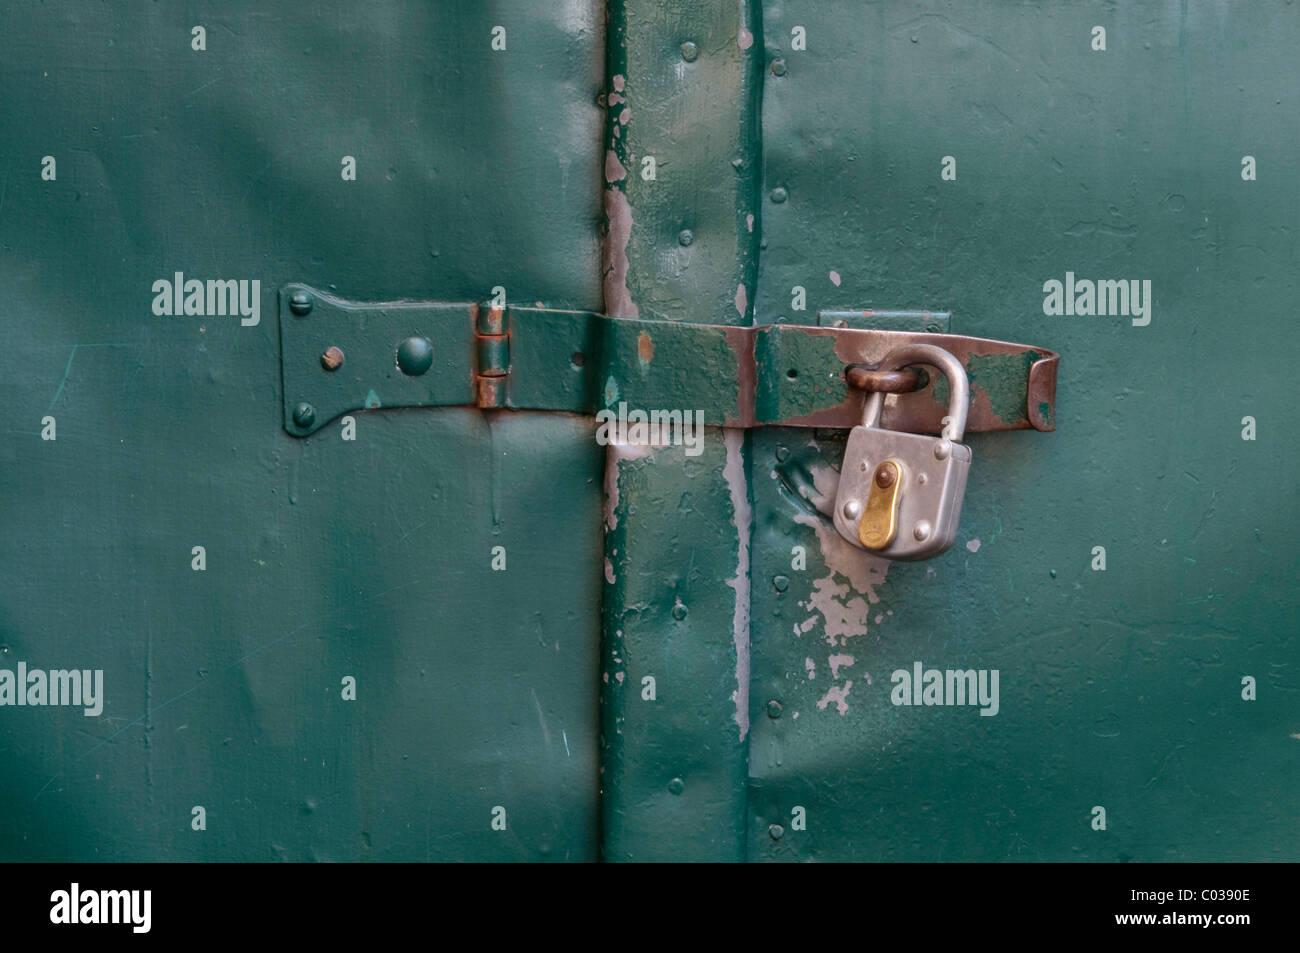 Padlocked gate latch - Stock Image